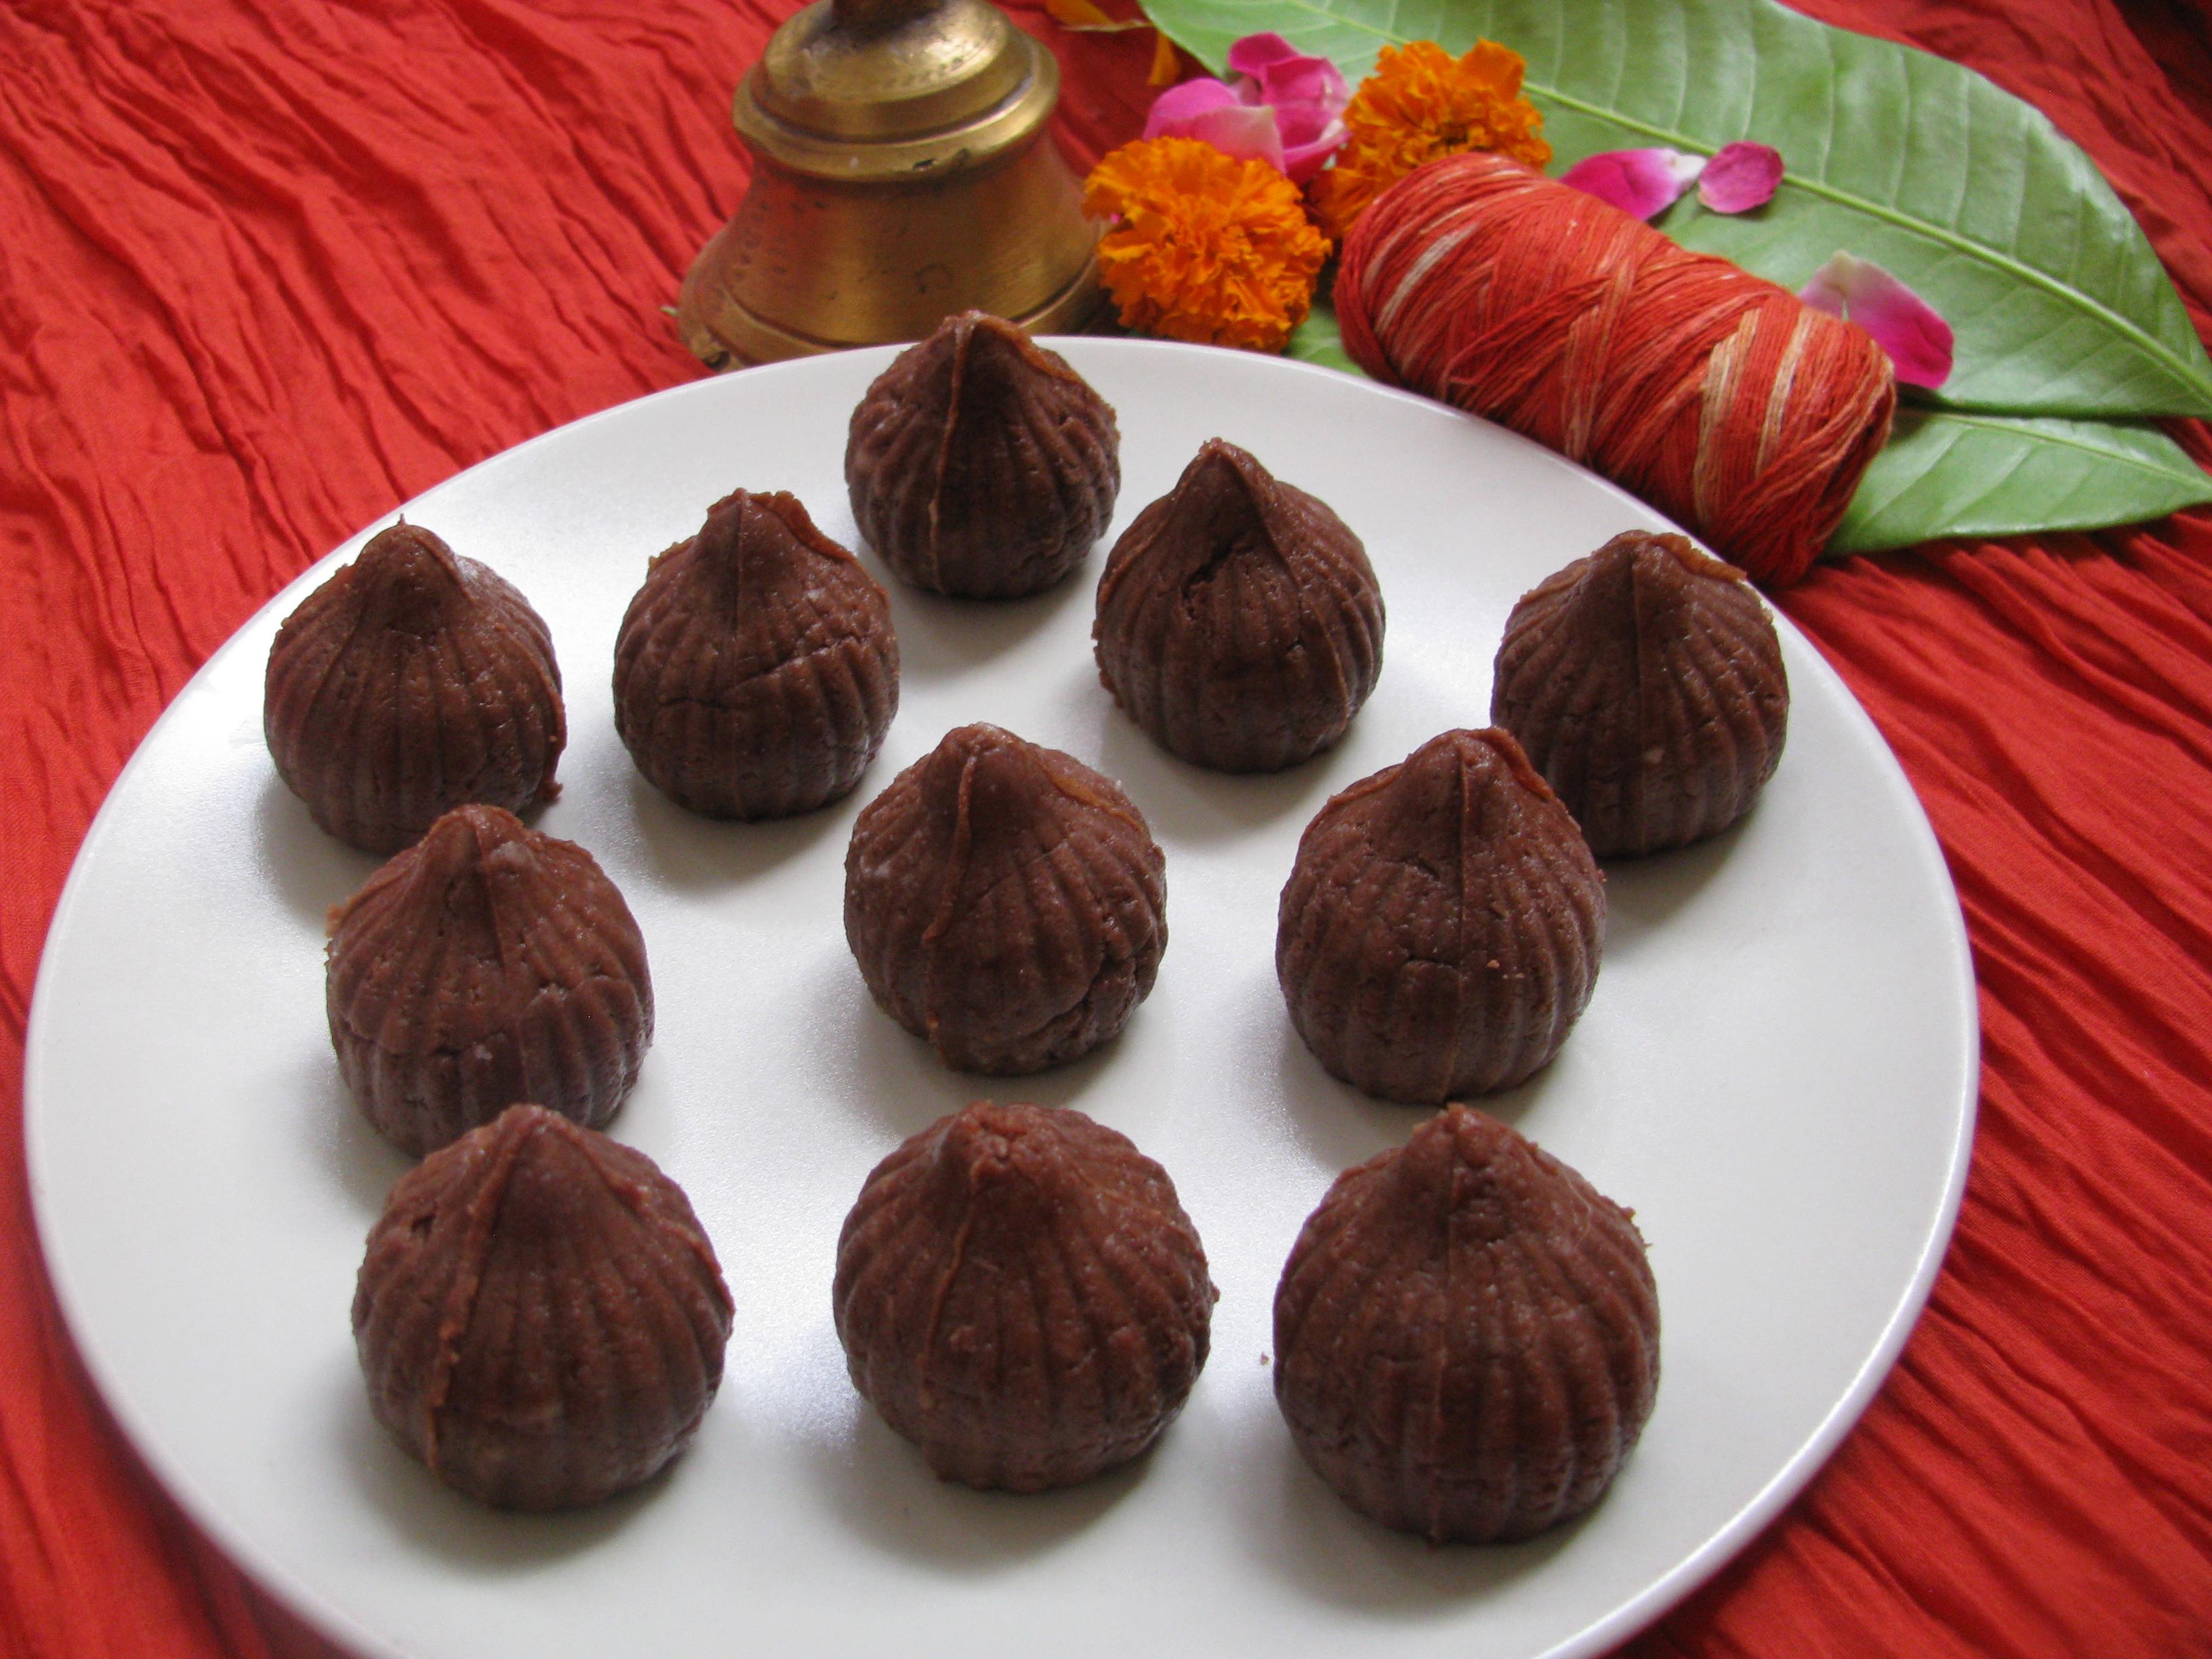 Chocolate Modak Recipe | How To Make Chocolate Modak from Khoa or Chenna